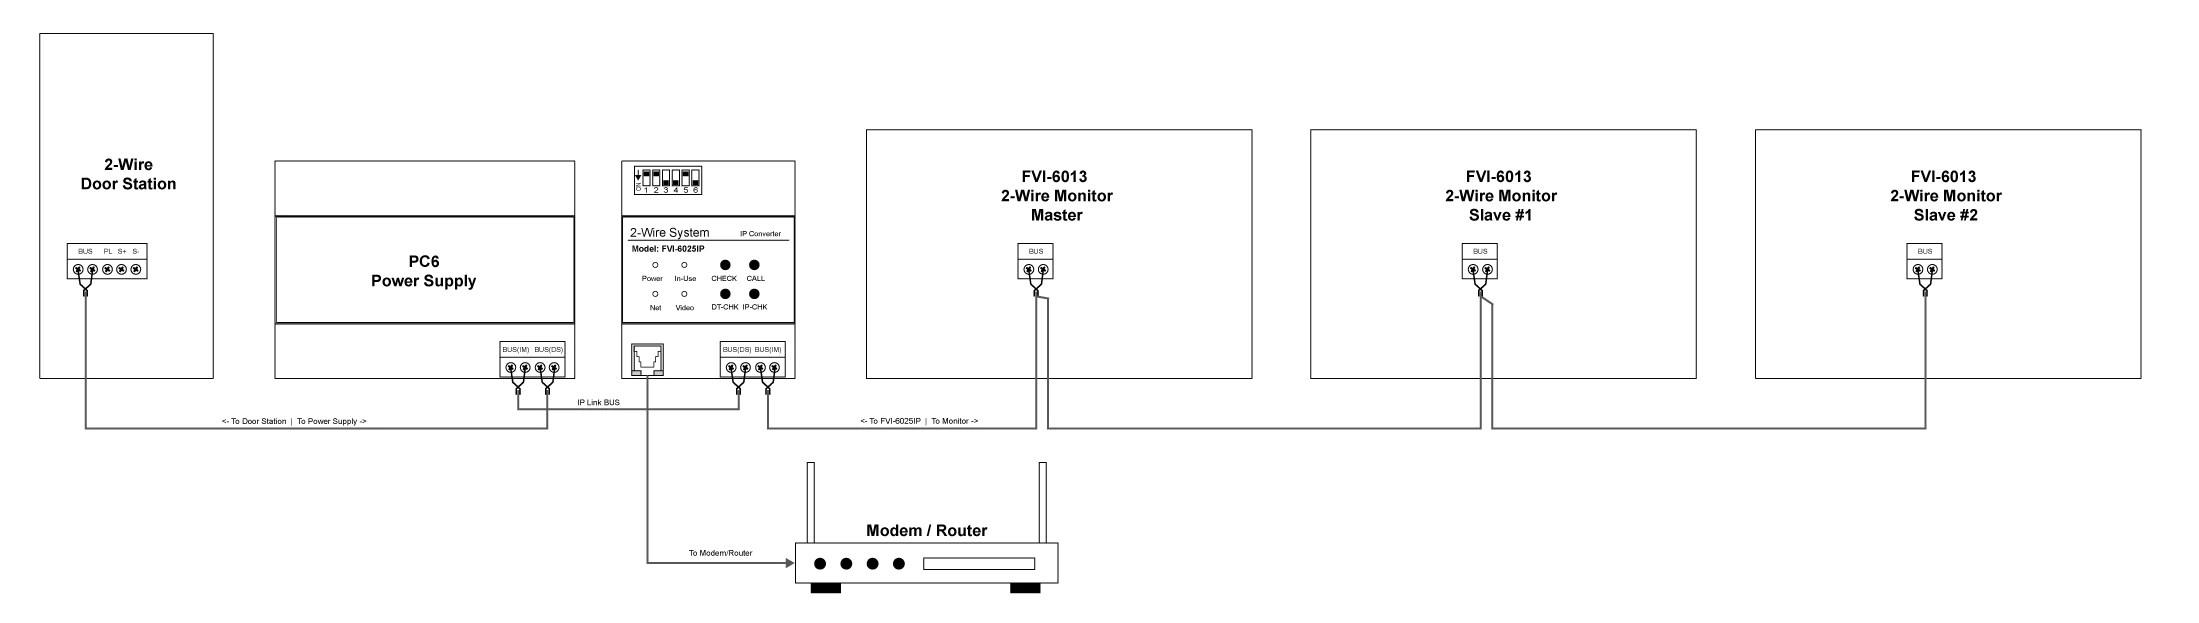 medium resolution of 2 wire app instructions